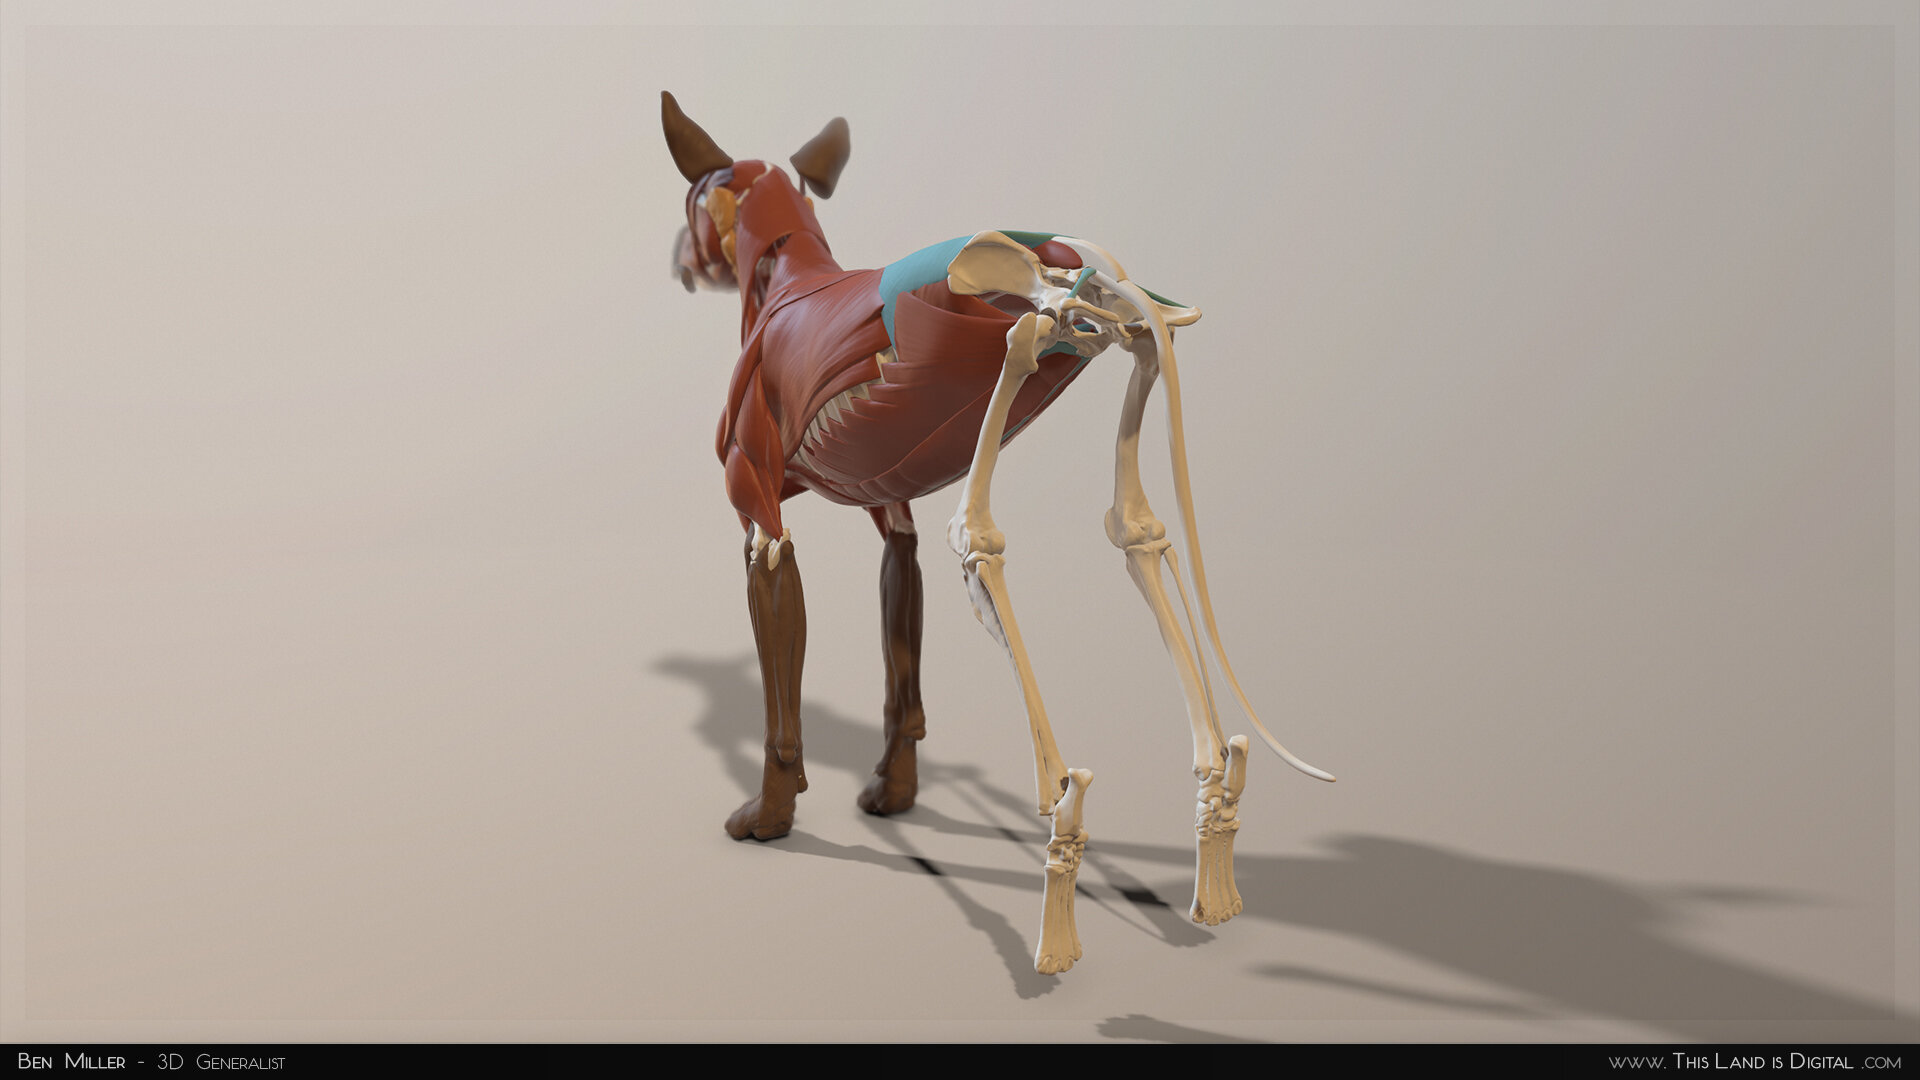 TLiD_BenMiller_AnatomyDogStudy-Split_02.jpg